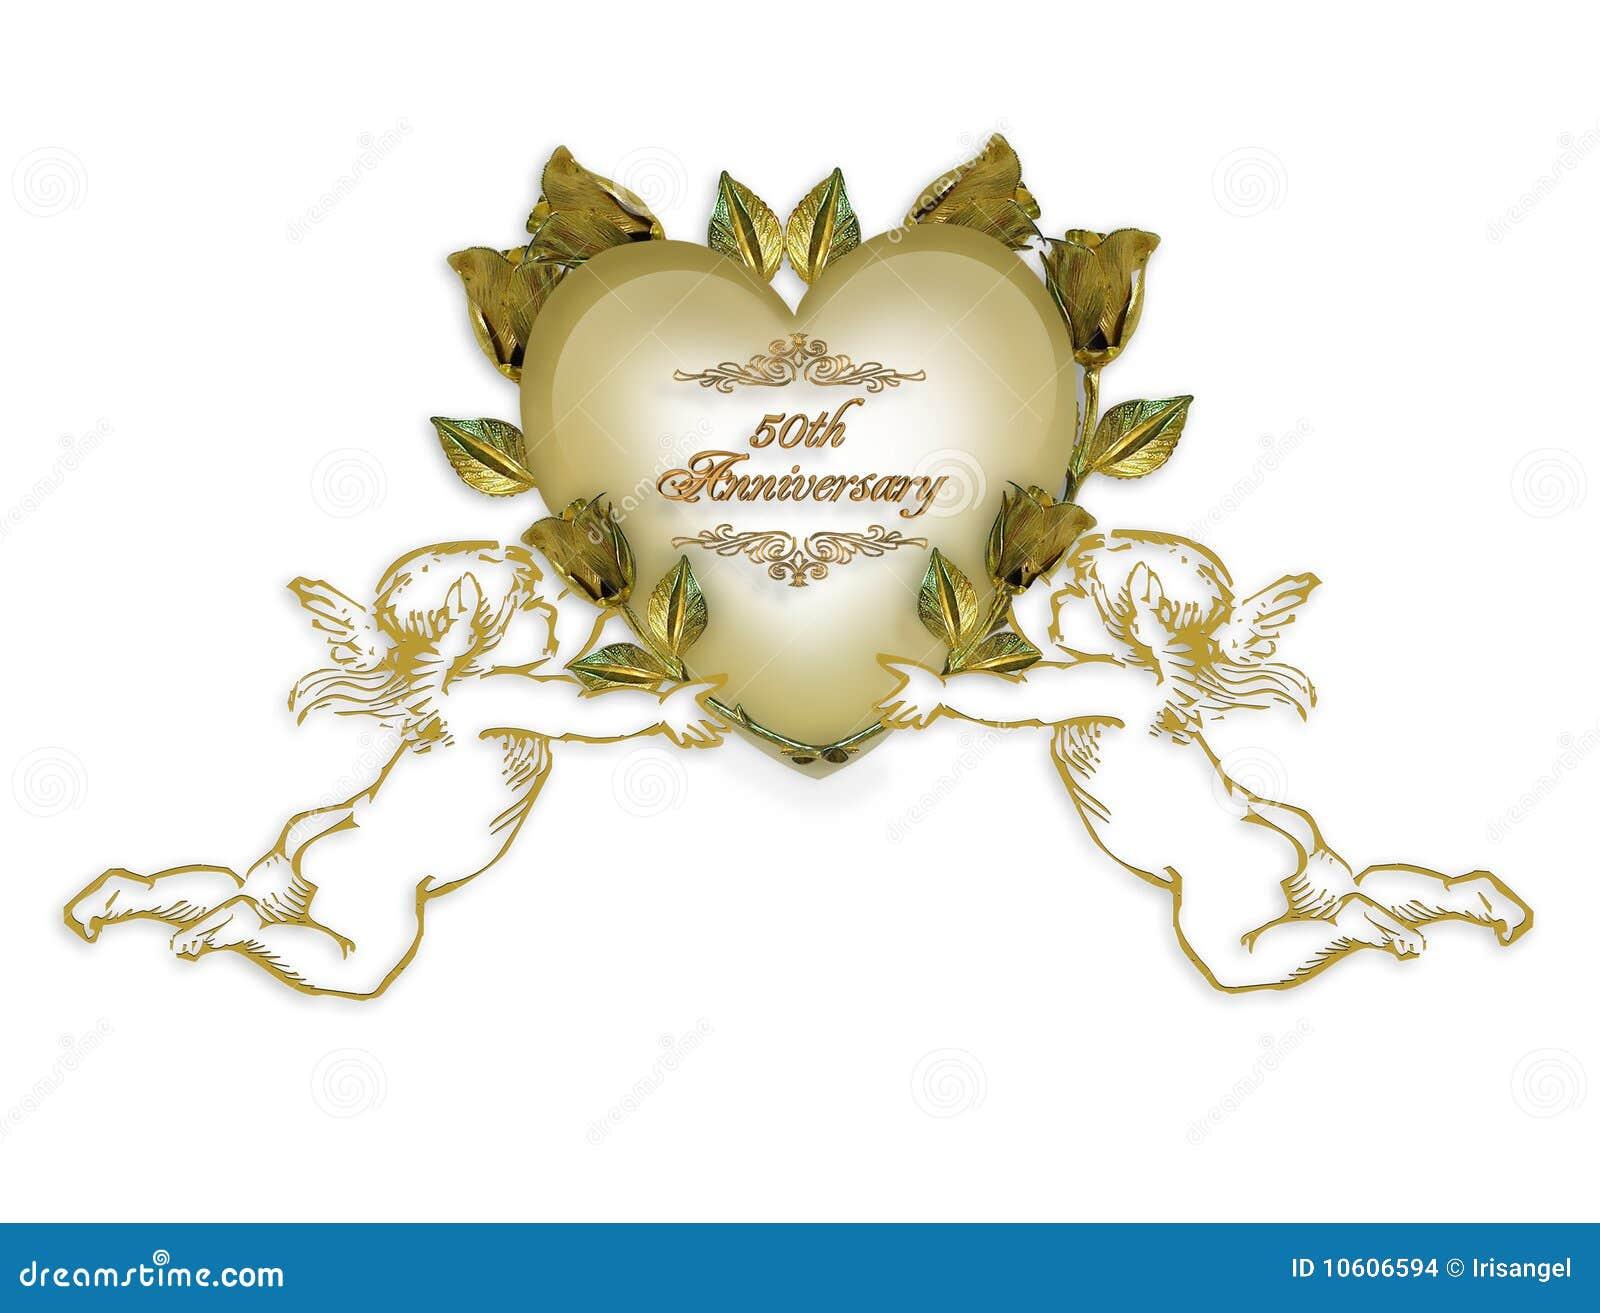 Hydrangea Invitations is great invitations ideas